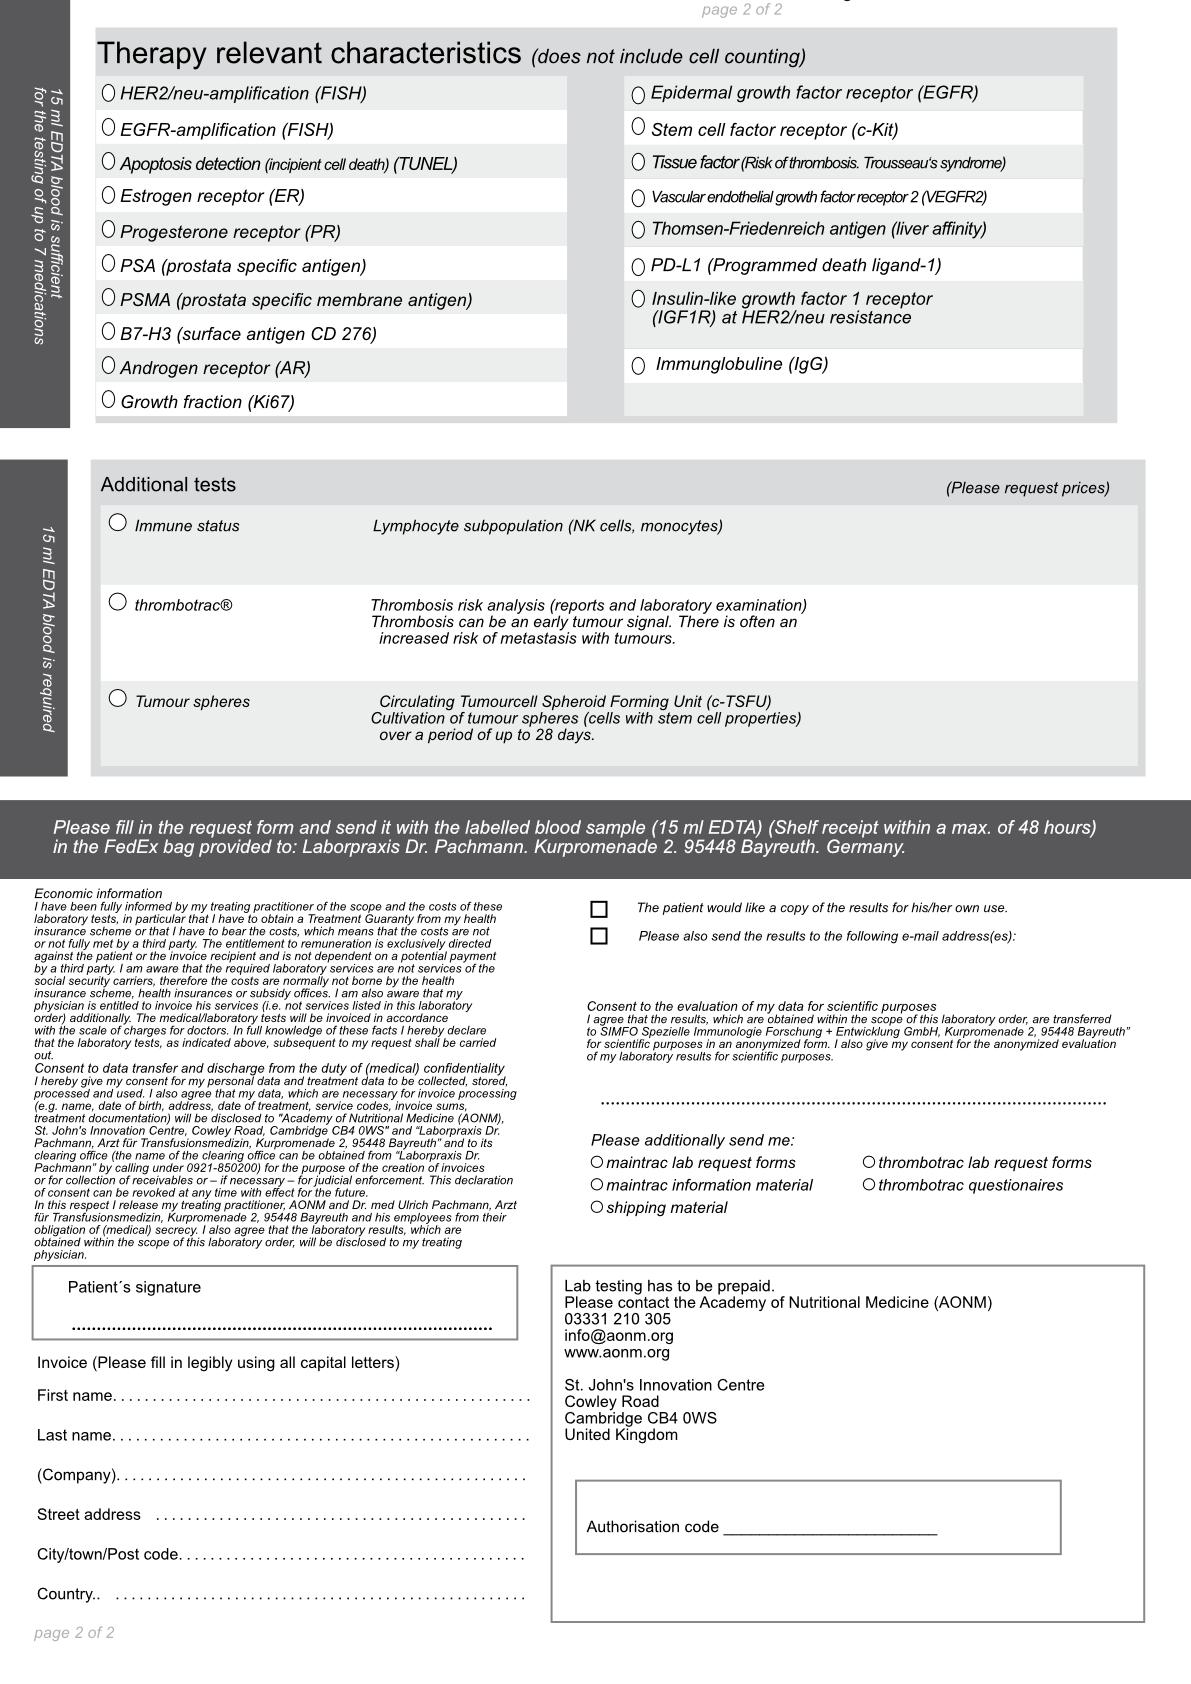 order-form-english-p2